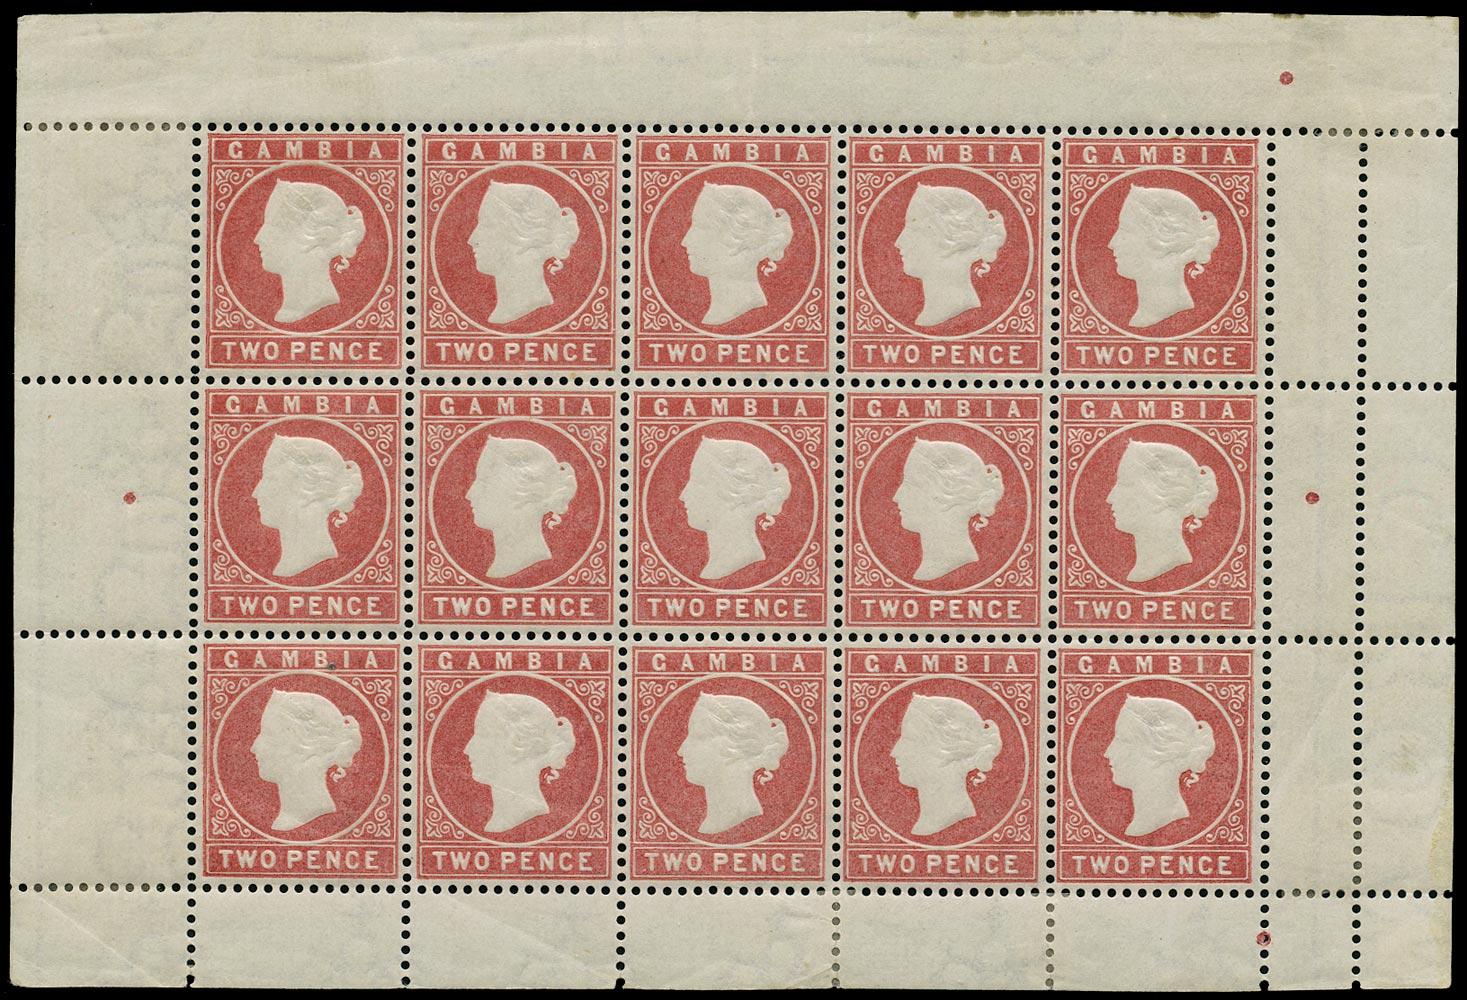 GAMBIA 1880  SG13B Mint 2d rose watermark CC upright